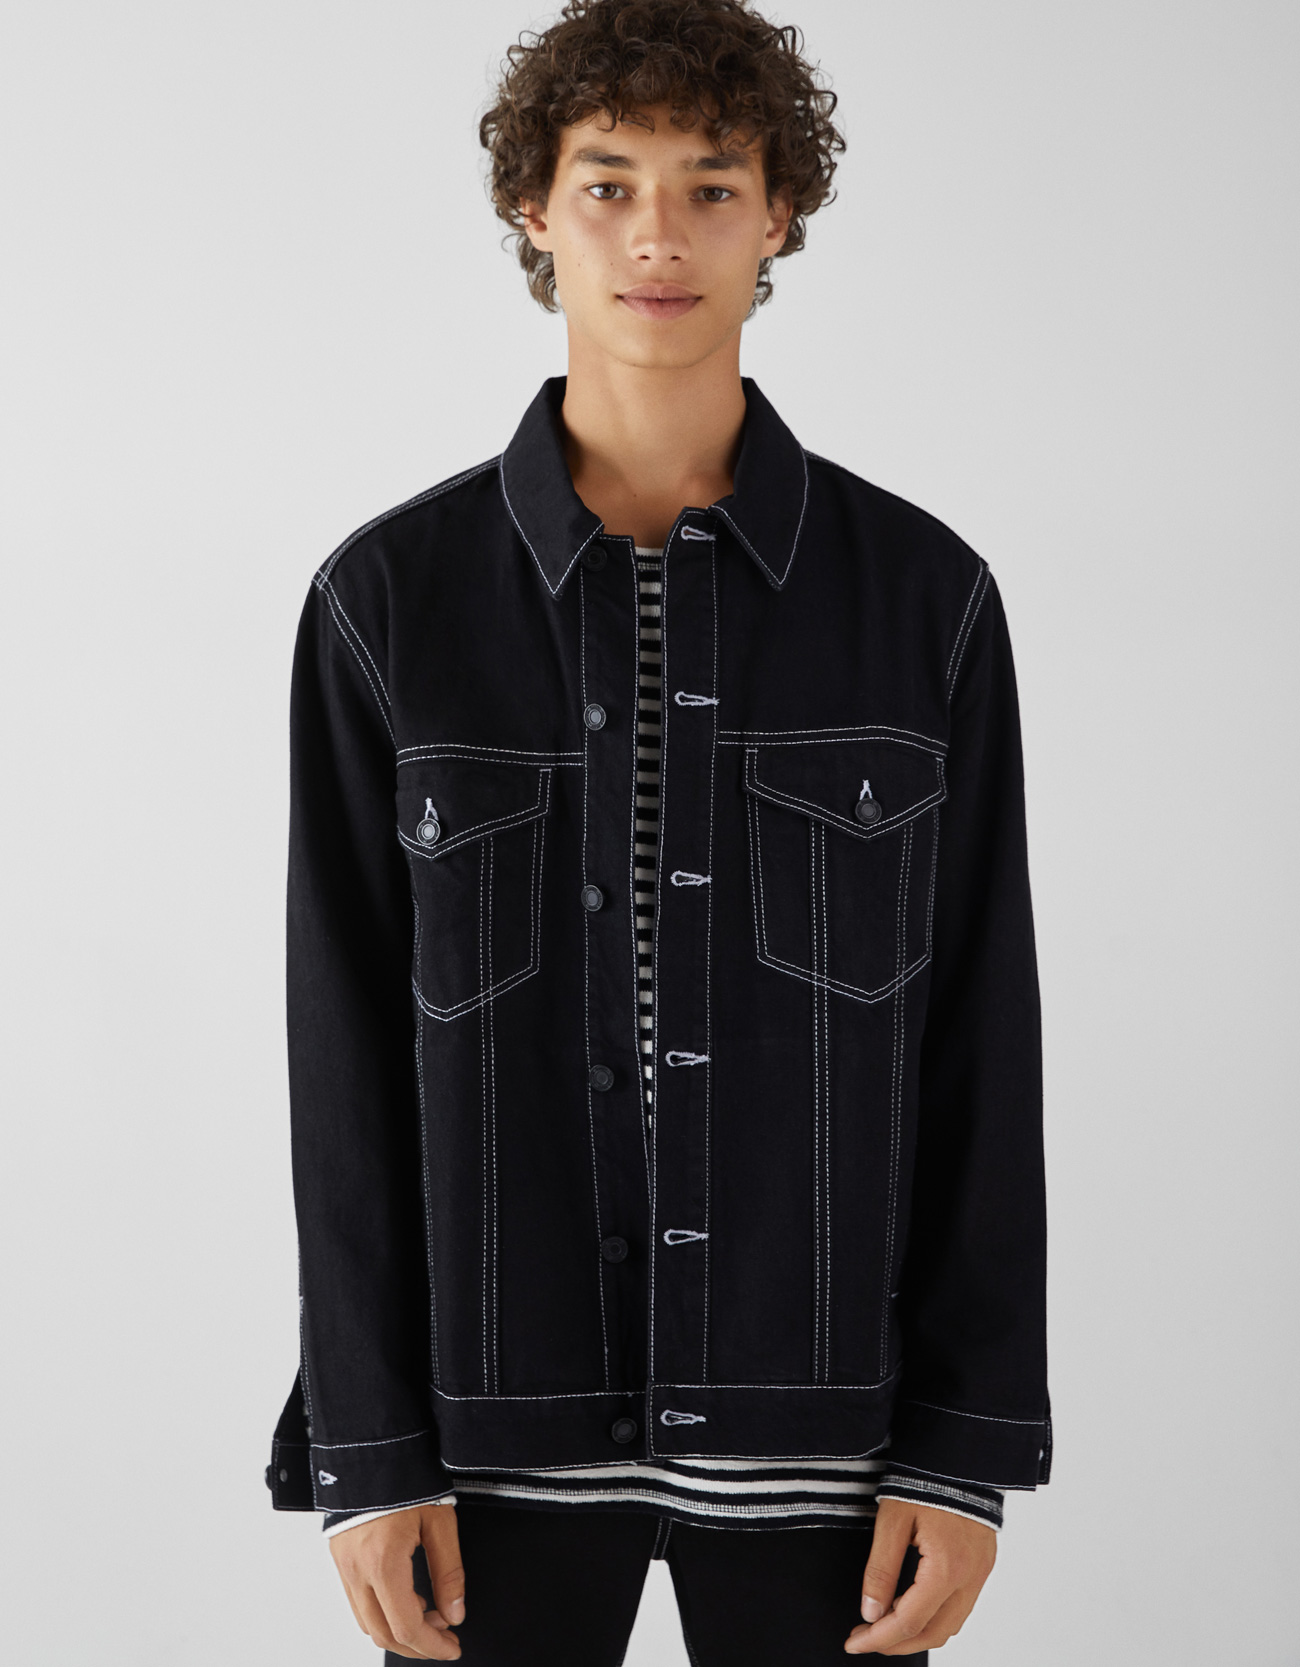 Jeansjacke mit Kontrast